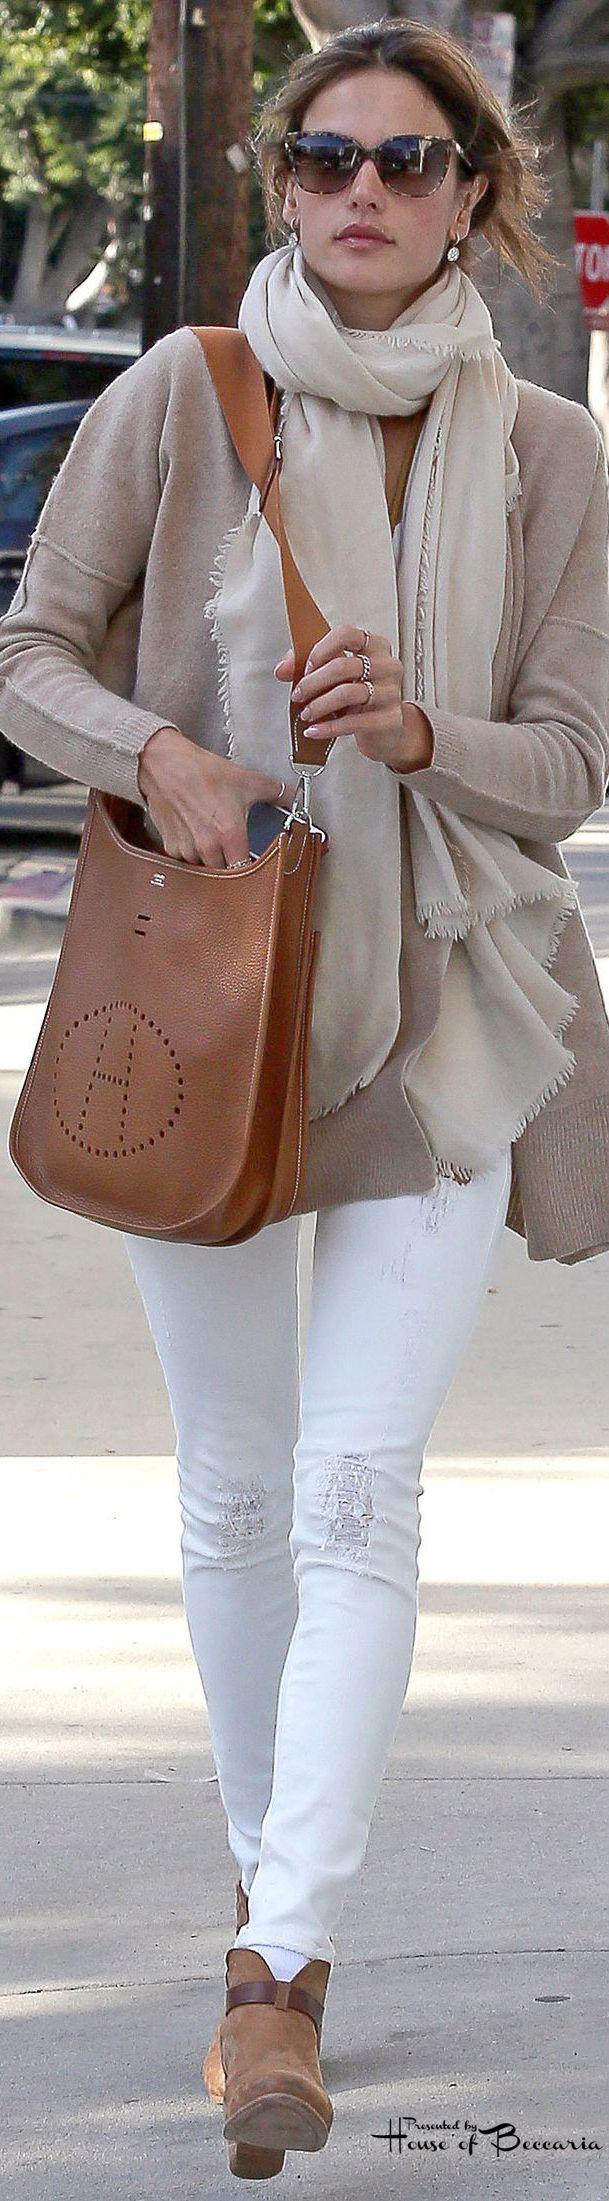 "Alessandra Ambrosio - Hermes ""Evelyne Messenger"" Bag | House of Beccaria"